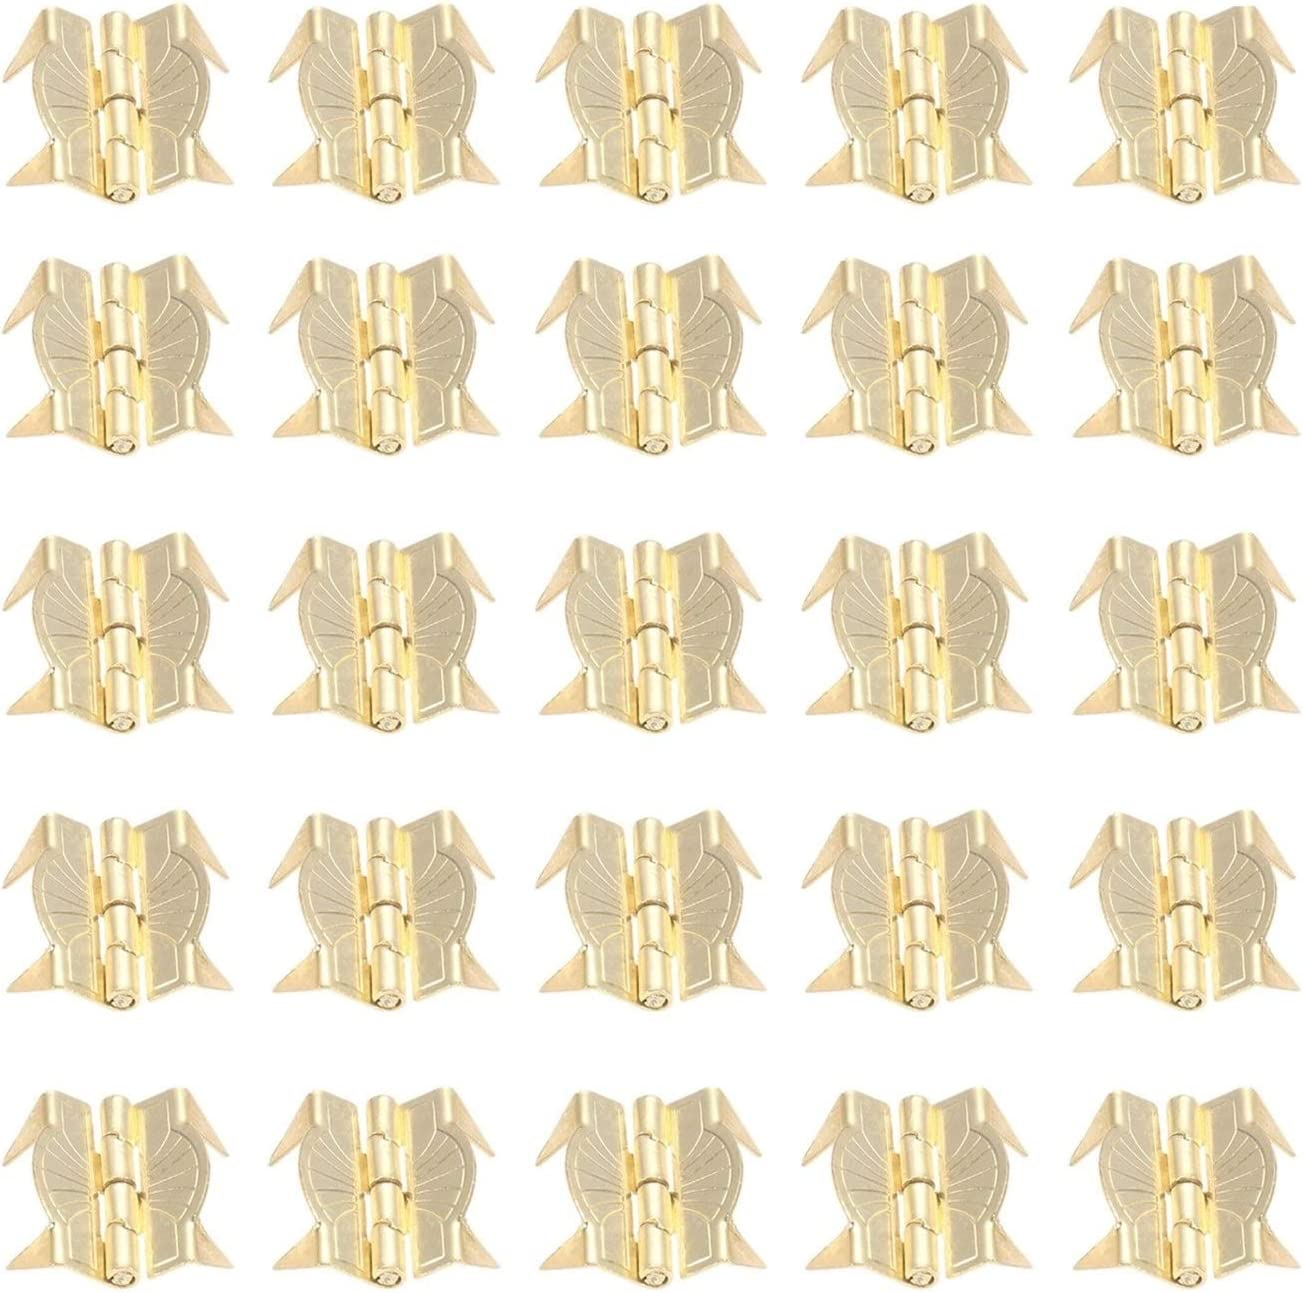 Small Ranking TOP9 Retro Decorative Bolt 50Pcs Door Popular popular Yellow Lugg Cabinet Metal